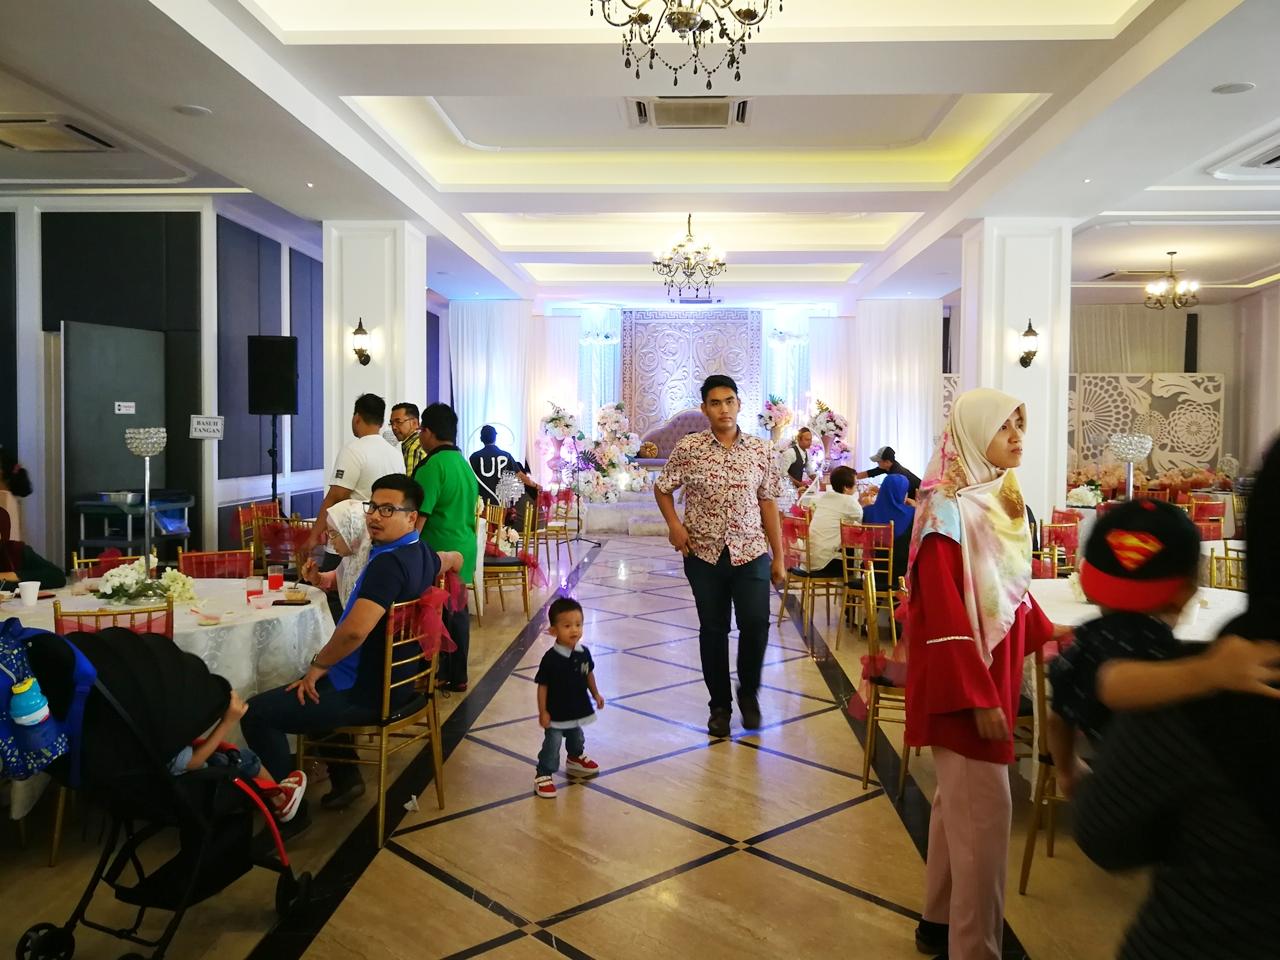 Hari Terbuka & Uji Rasa Di Ambassador Putrajaya Pada 12 Ogos 2018